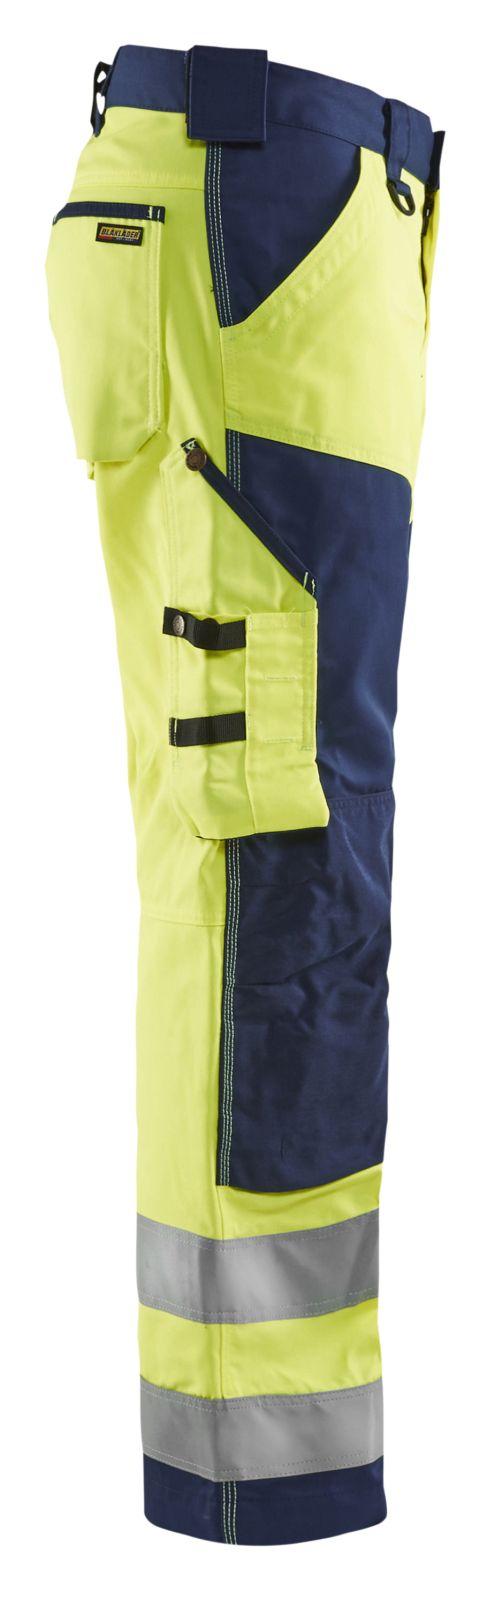 Blaklader Werkbroeken 15661811 High Vis geel-marineblauw(3389)